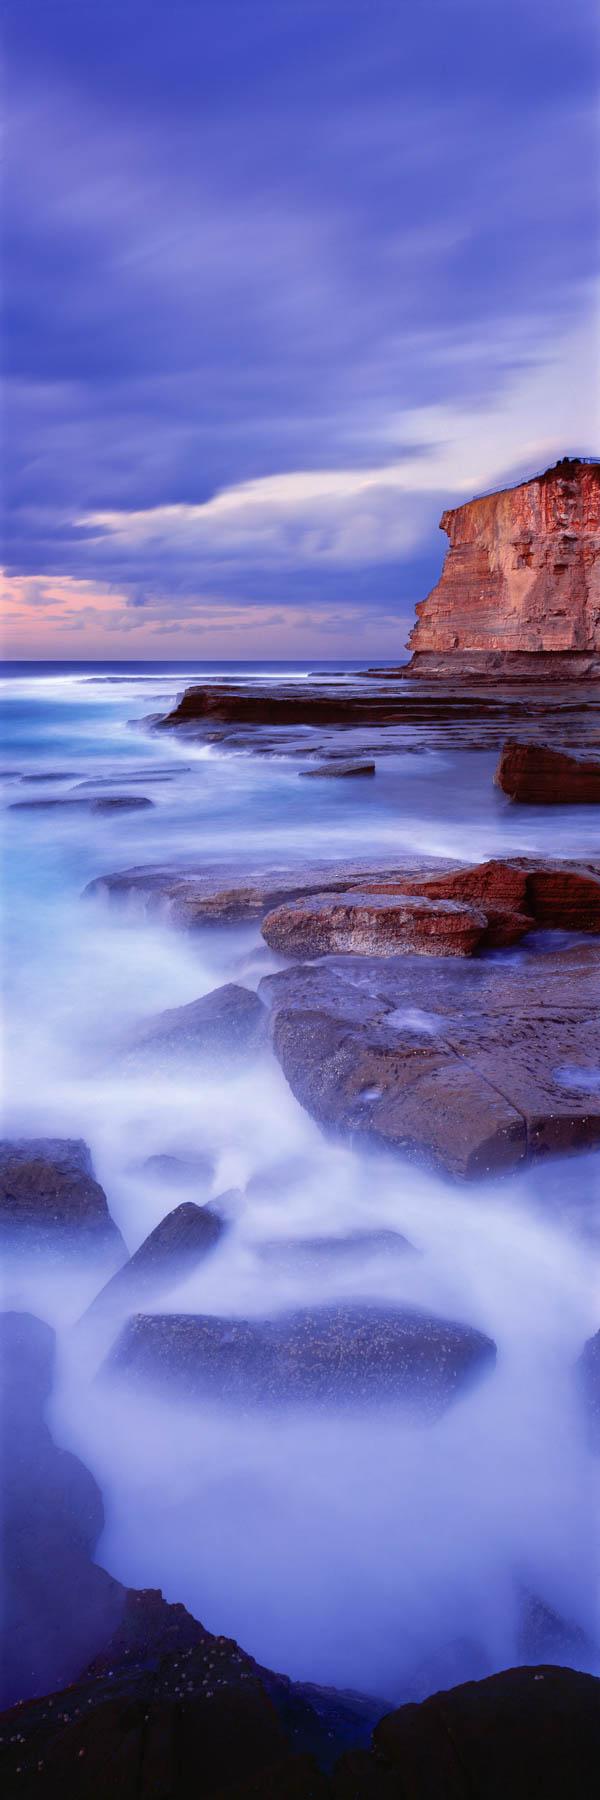 A moody, blue sunrise, over The Skillion, Terrigal, NSW, Australia.